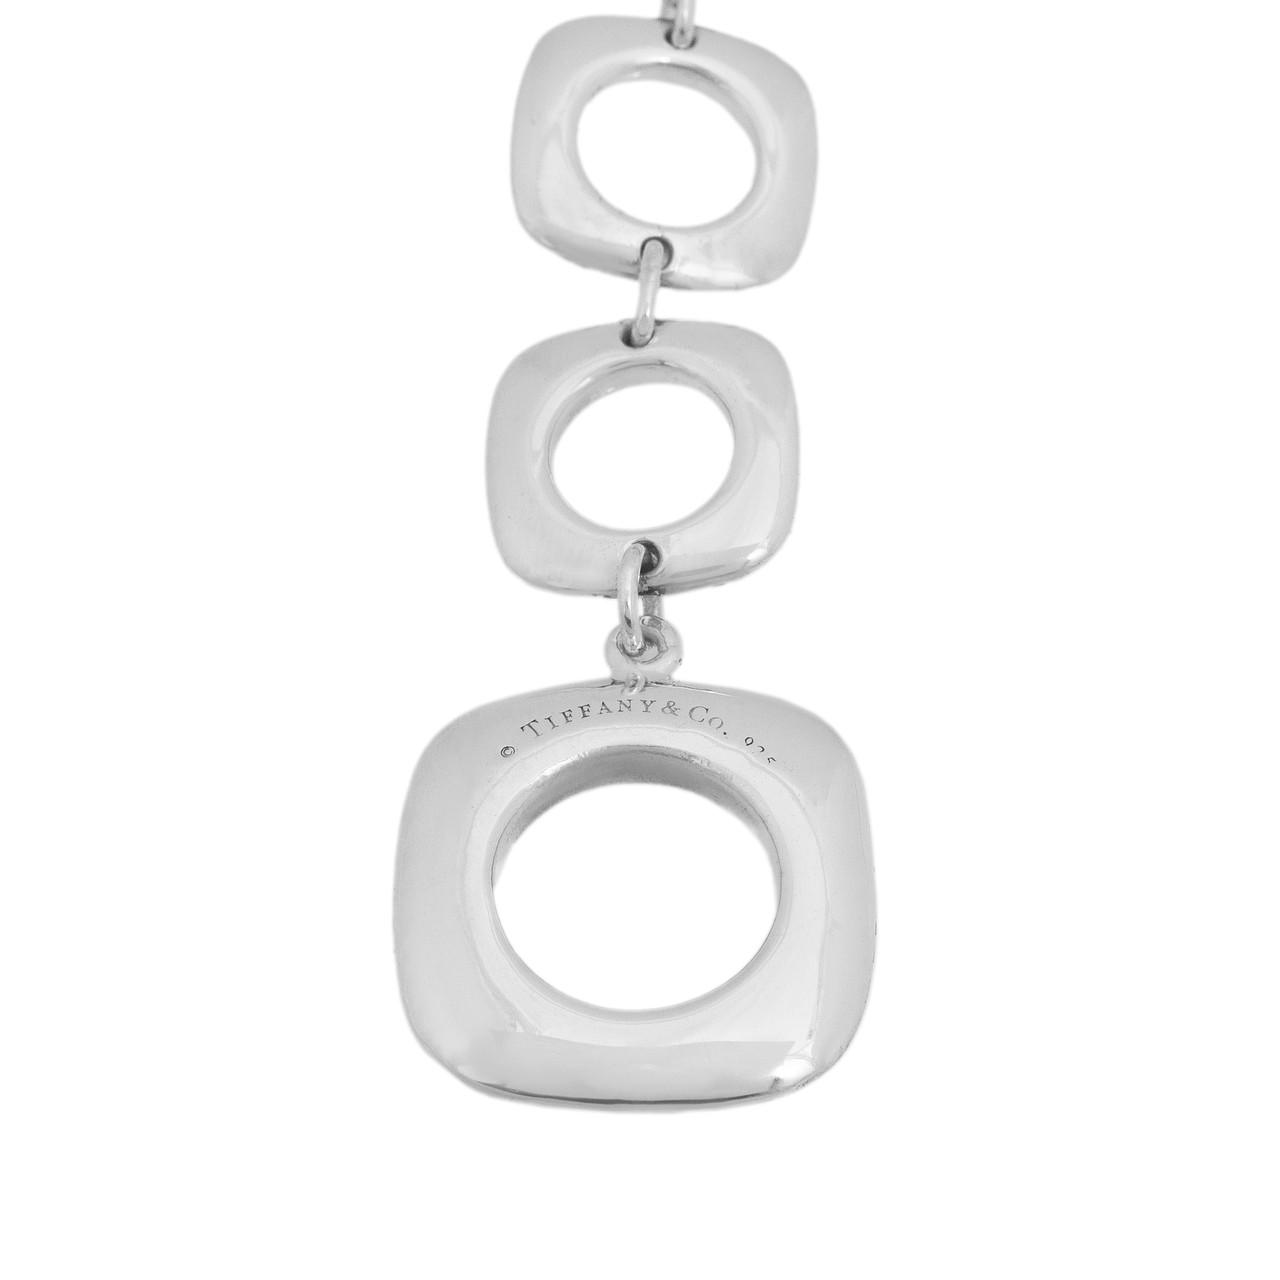 0ff23c871342 Tiffany   Co. Sterling Silver Cushion Toggle Bracelet - modaselle